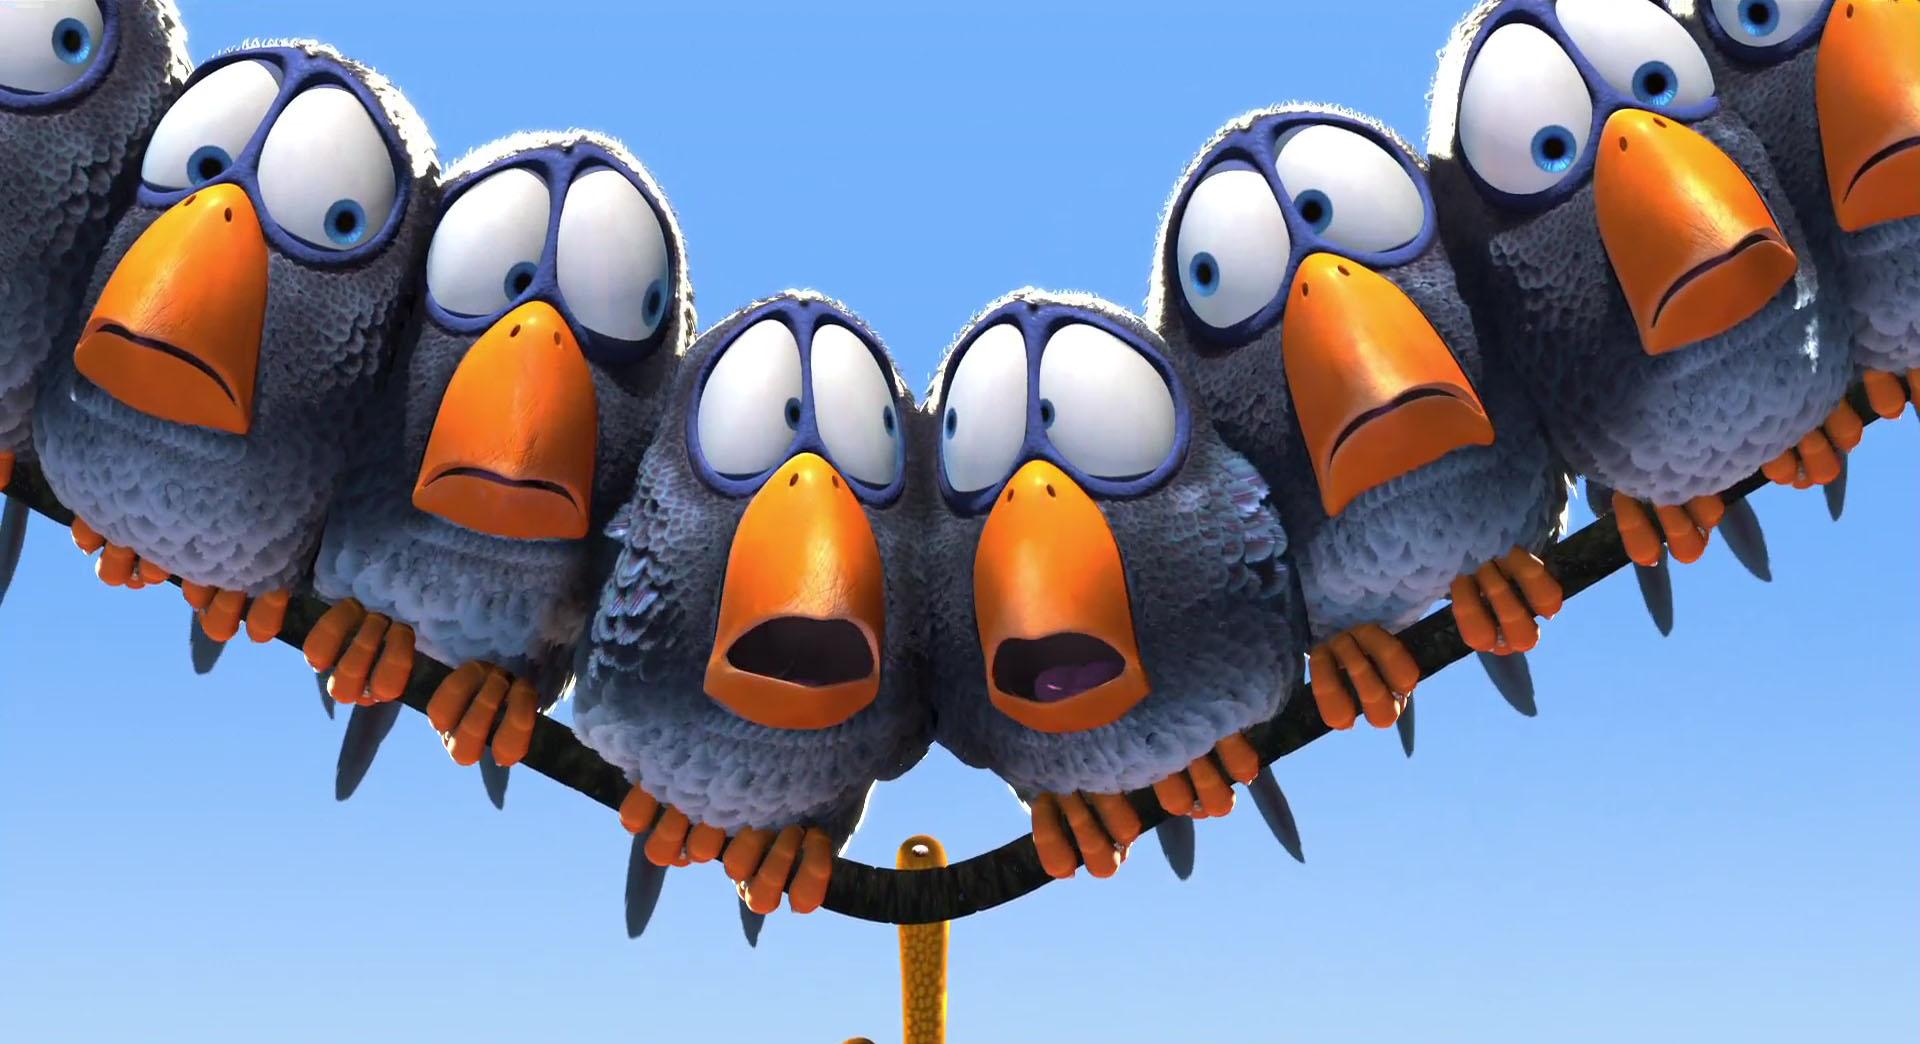 oiseau-personnage-drole-oiseau-ligne-haute-tension-04